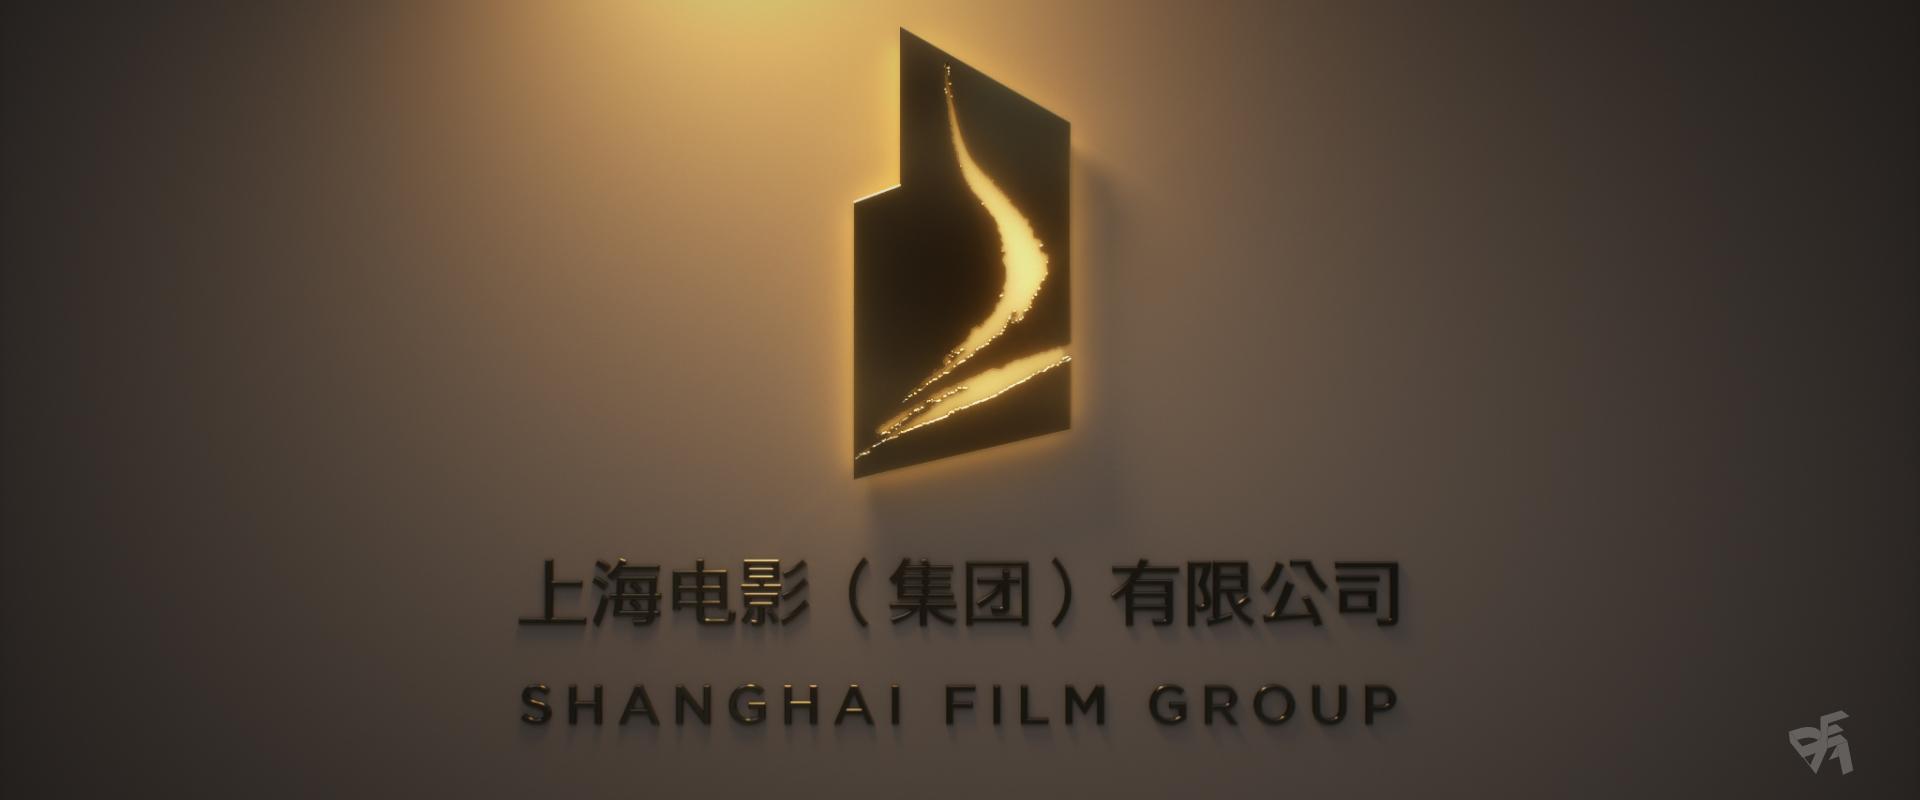 ShanghaiFilmGroup_STYLEFRAME_05.jpg